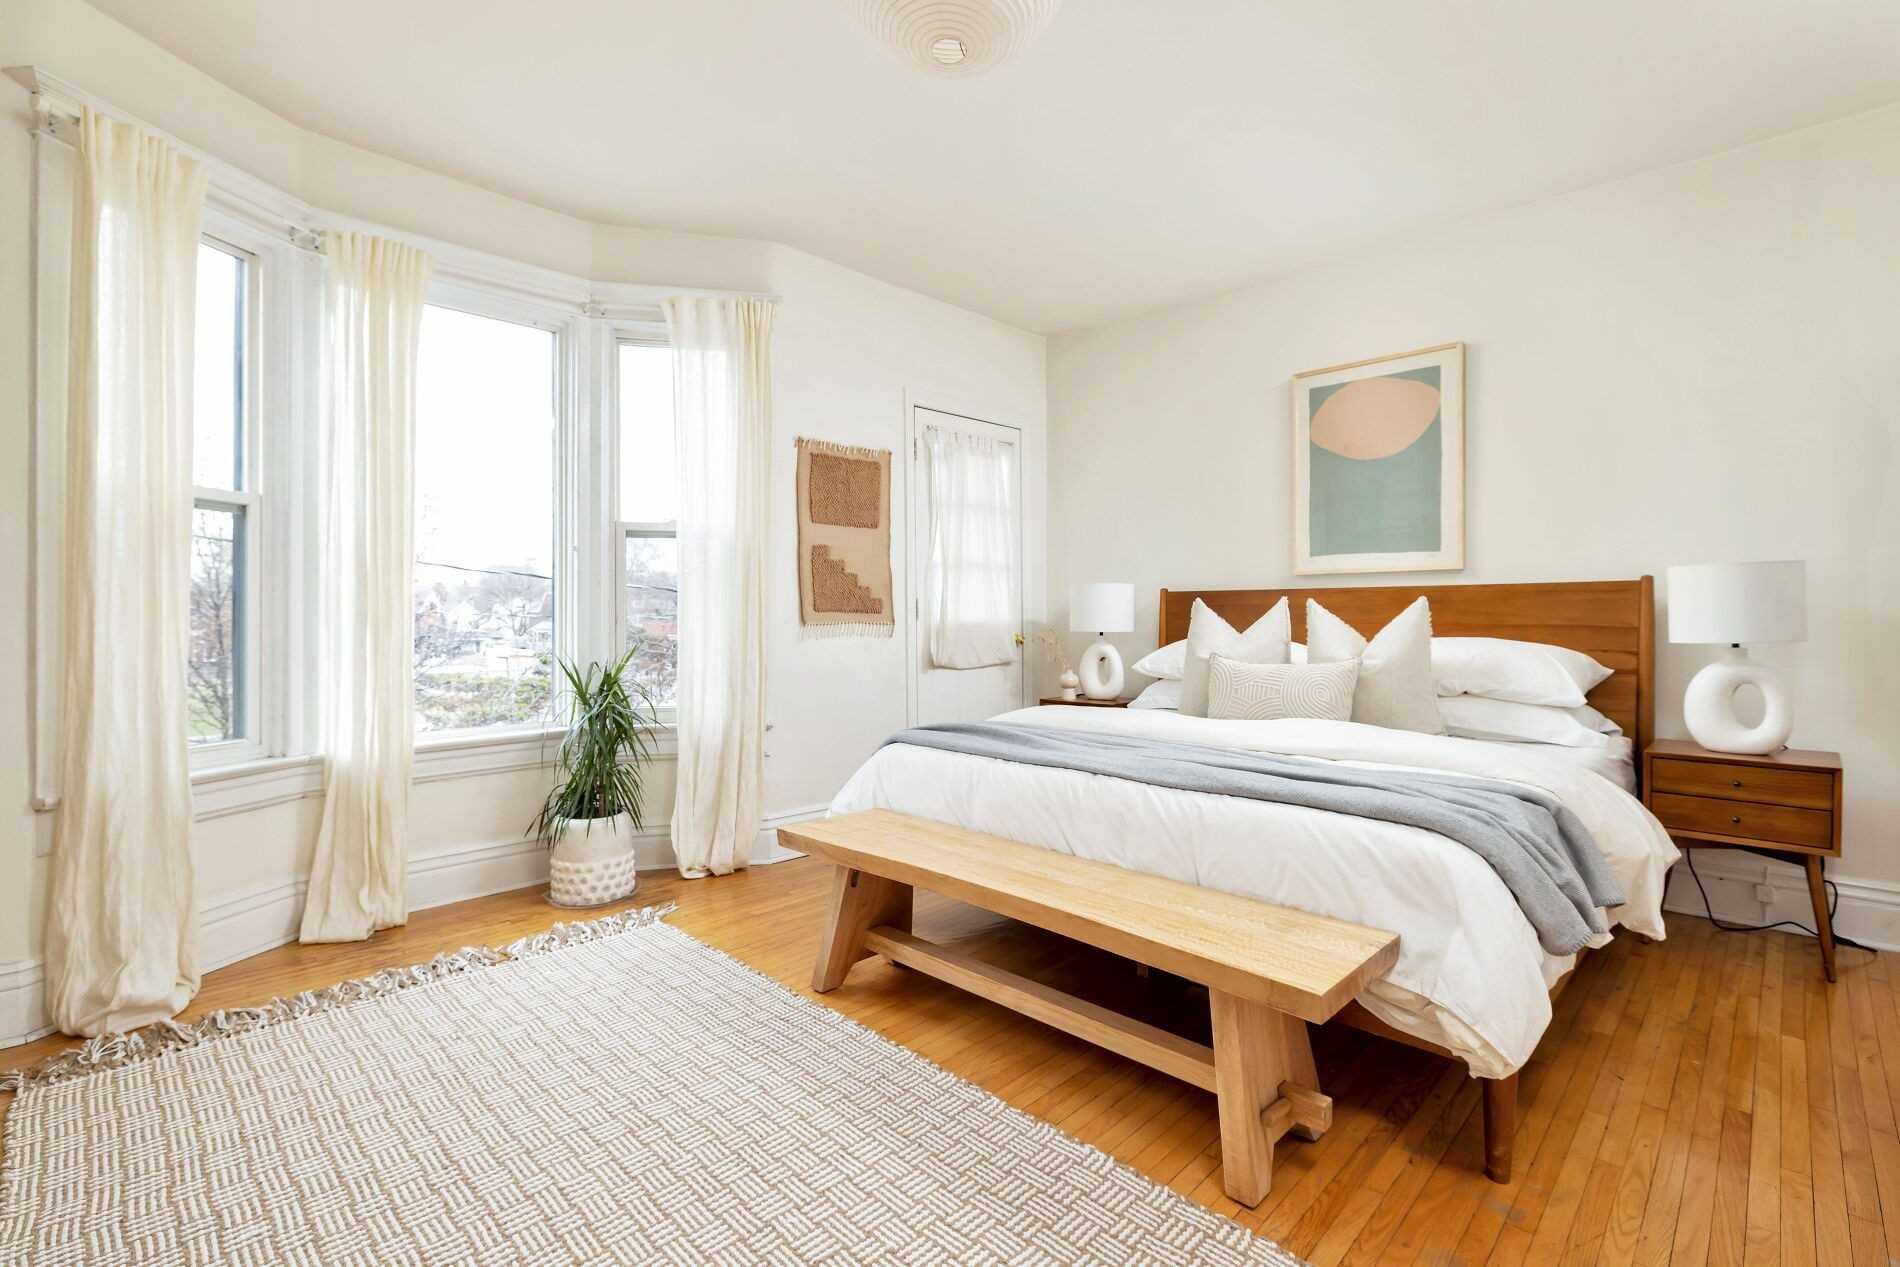 toronto house $502 over